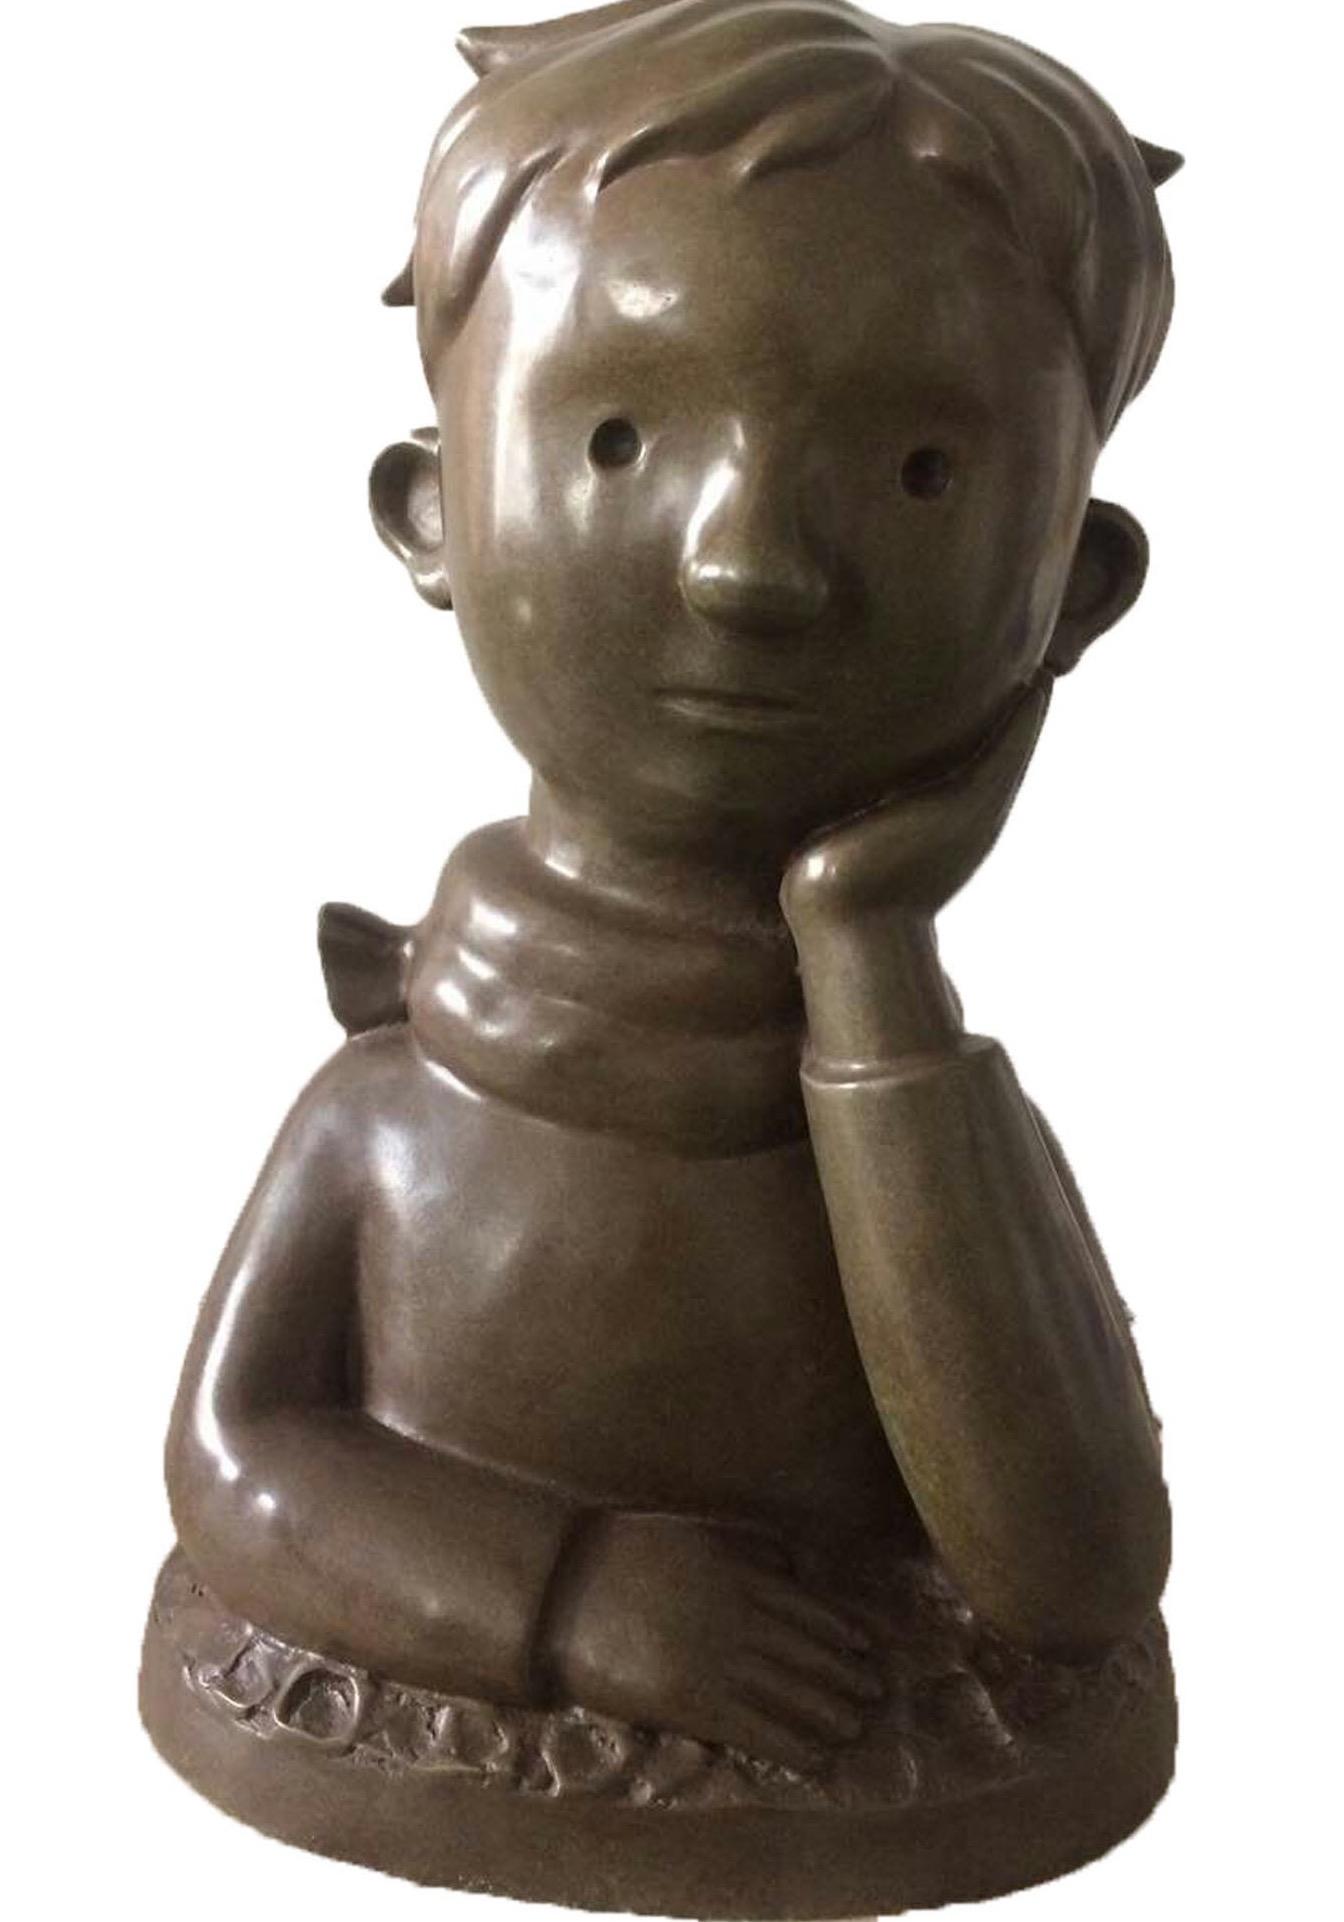 Little Prince by Shen Jingdong